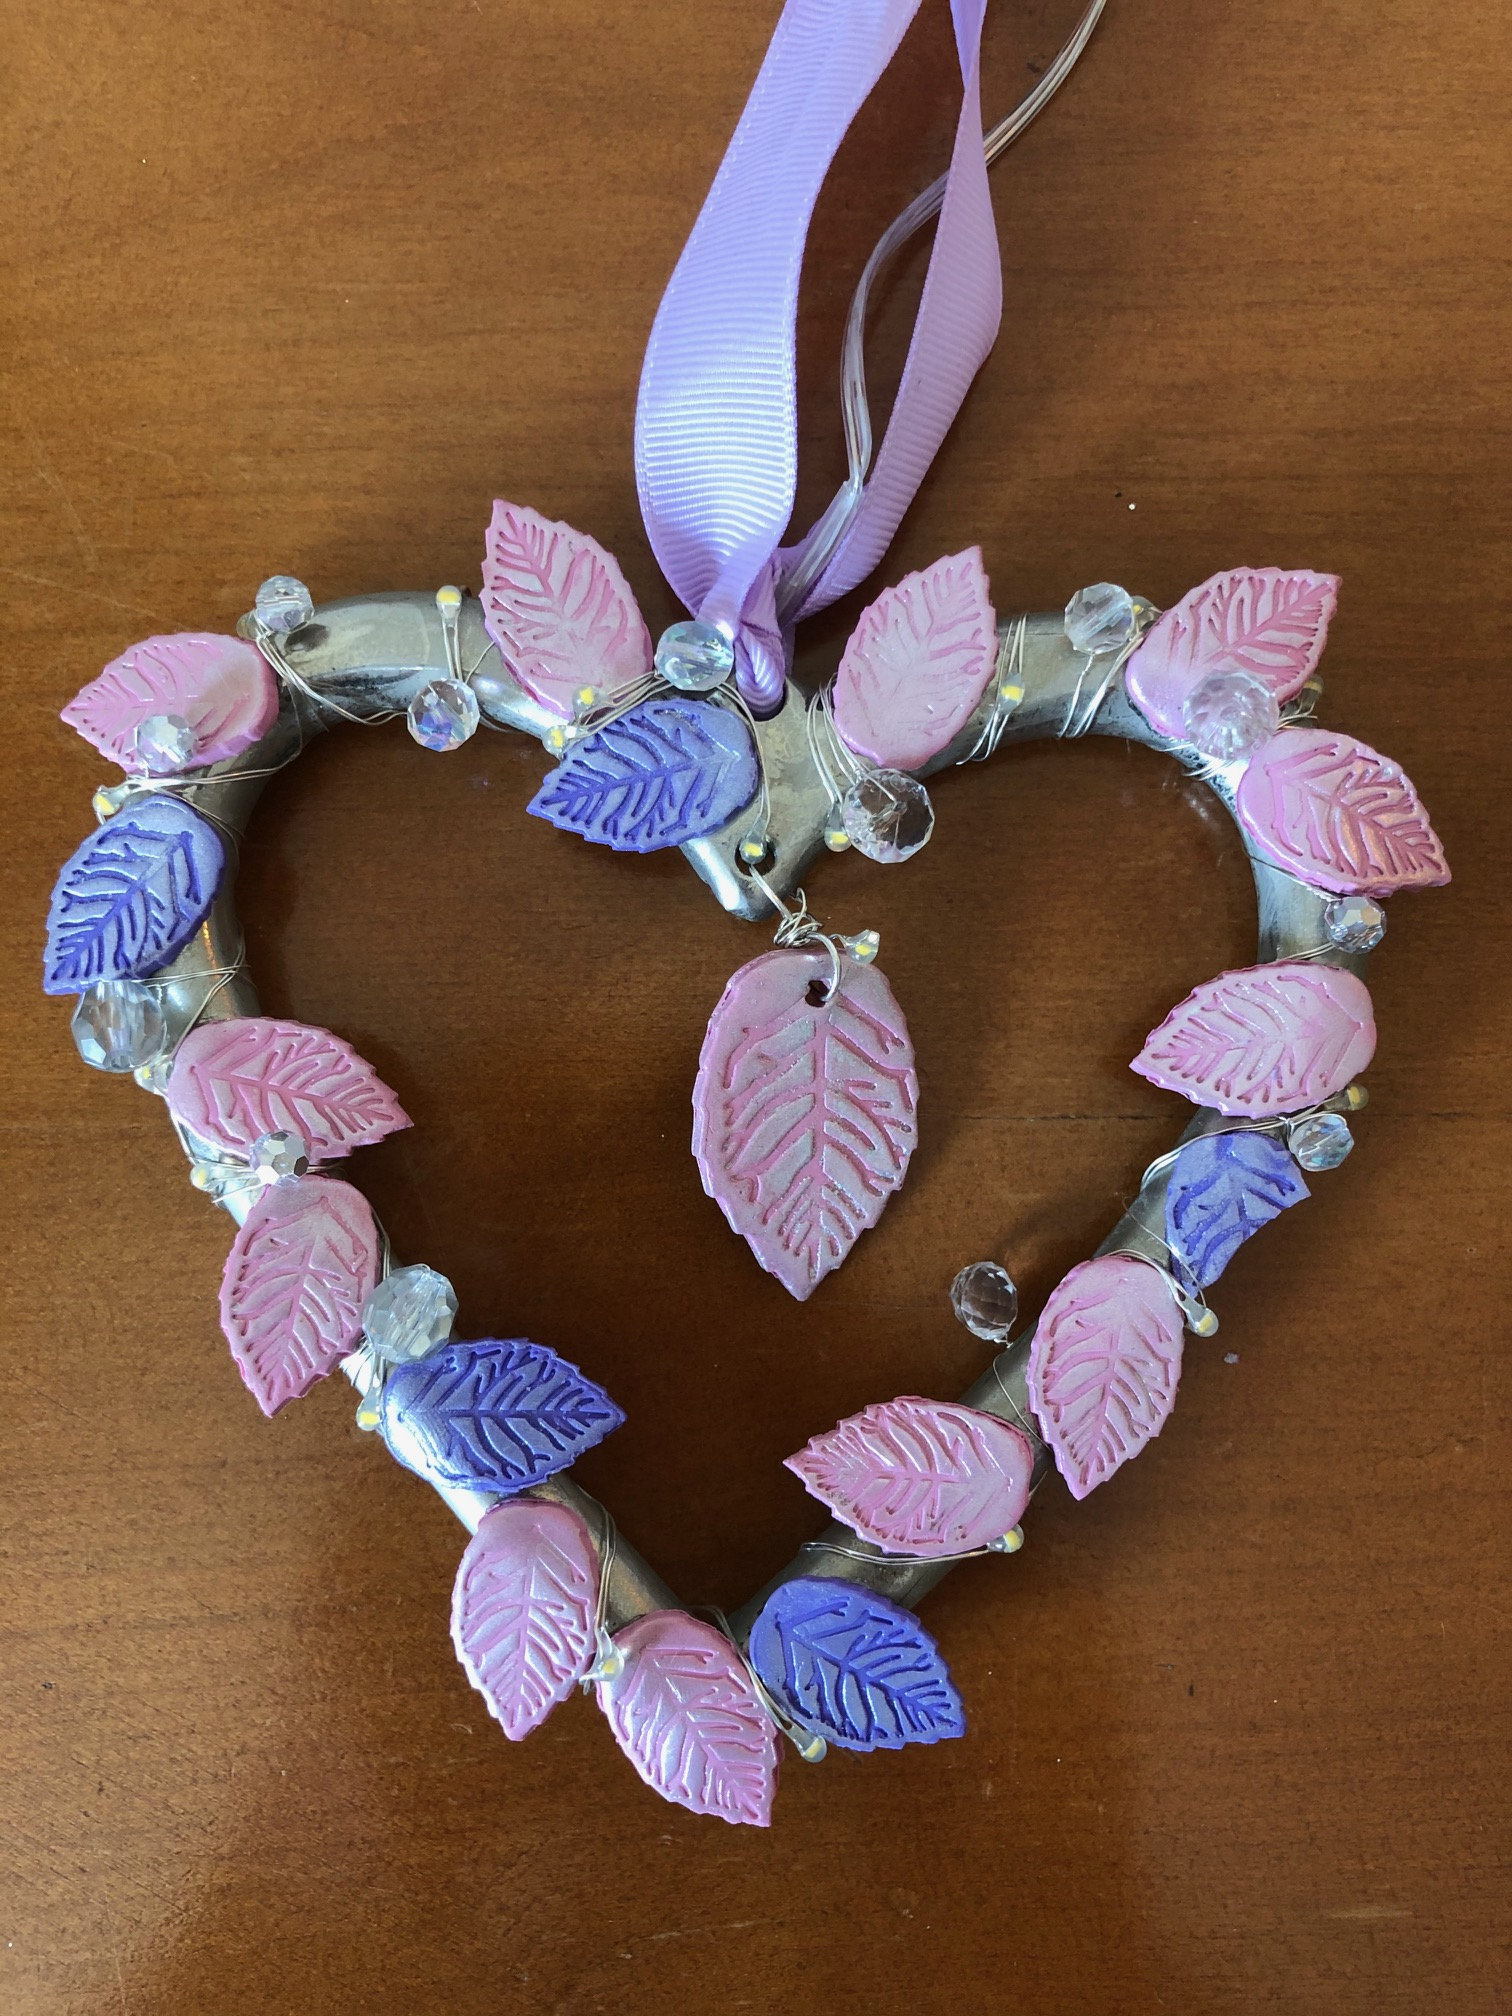 Heart (£20)